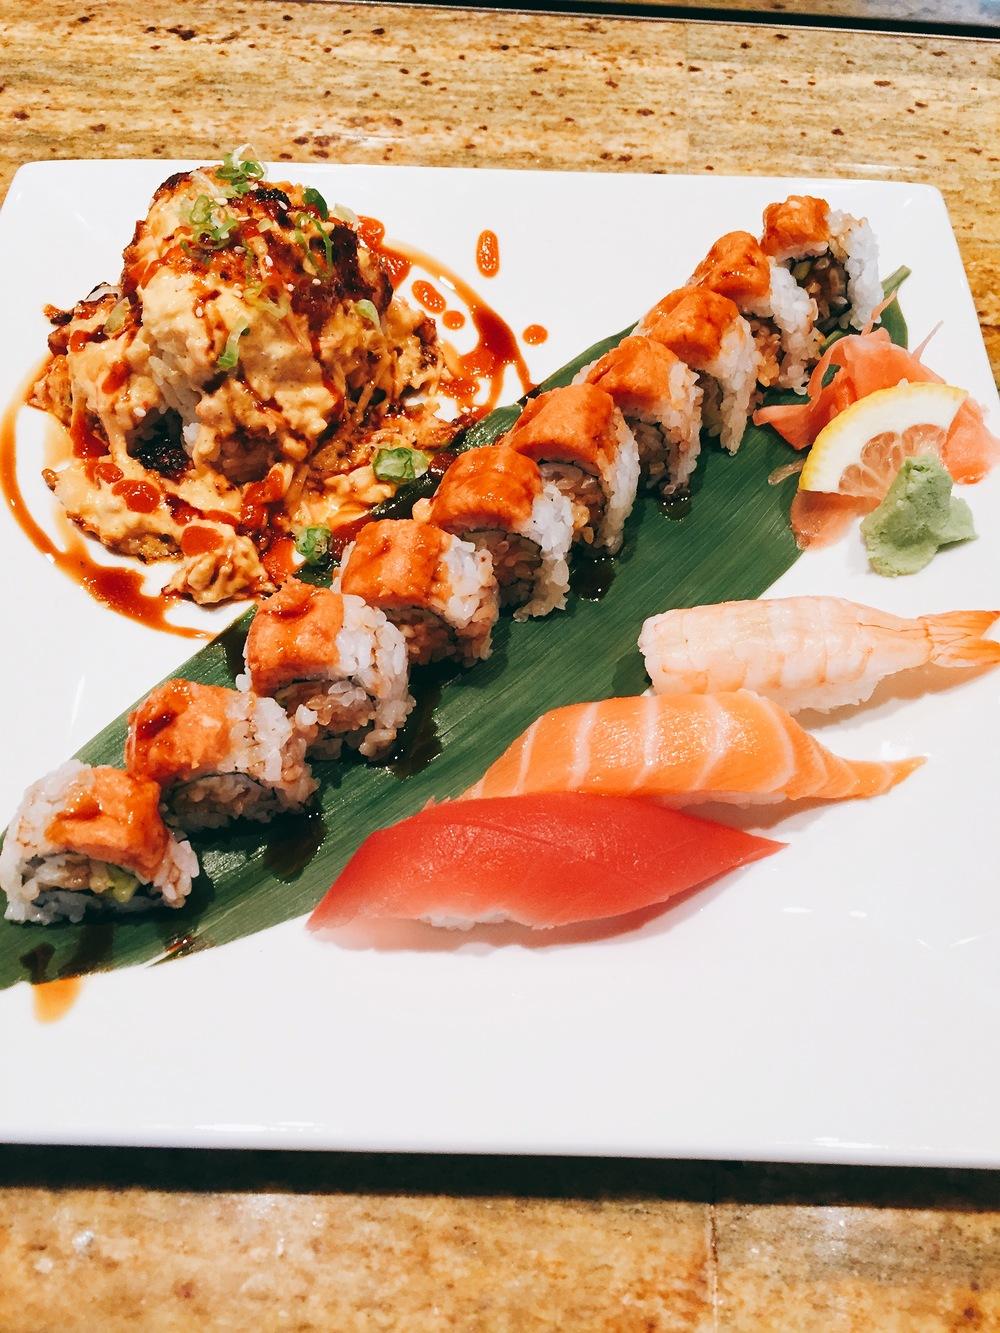 @mini volcano (california roll with shrimp, crab, scallops on top with rainbow sauce)  @eel & cucumber, spicy tuna on top  @shrimp, tuna & salmon nigiri